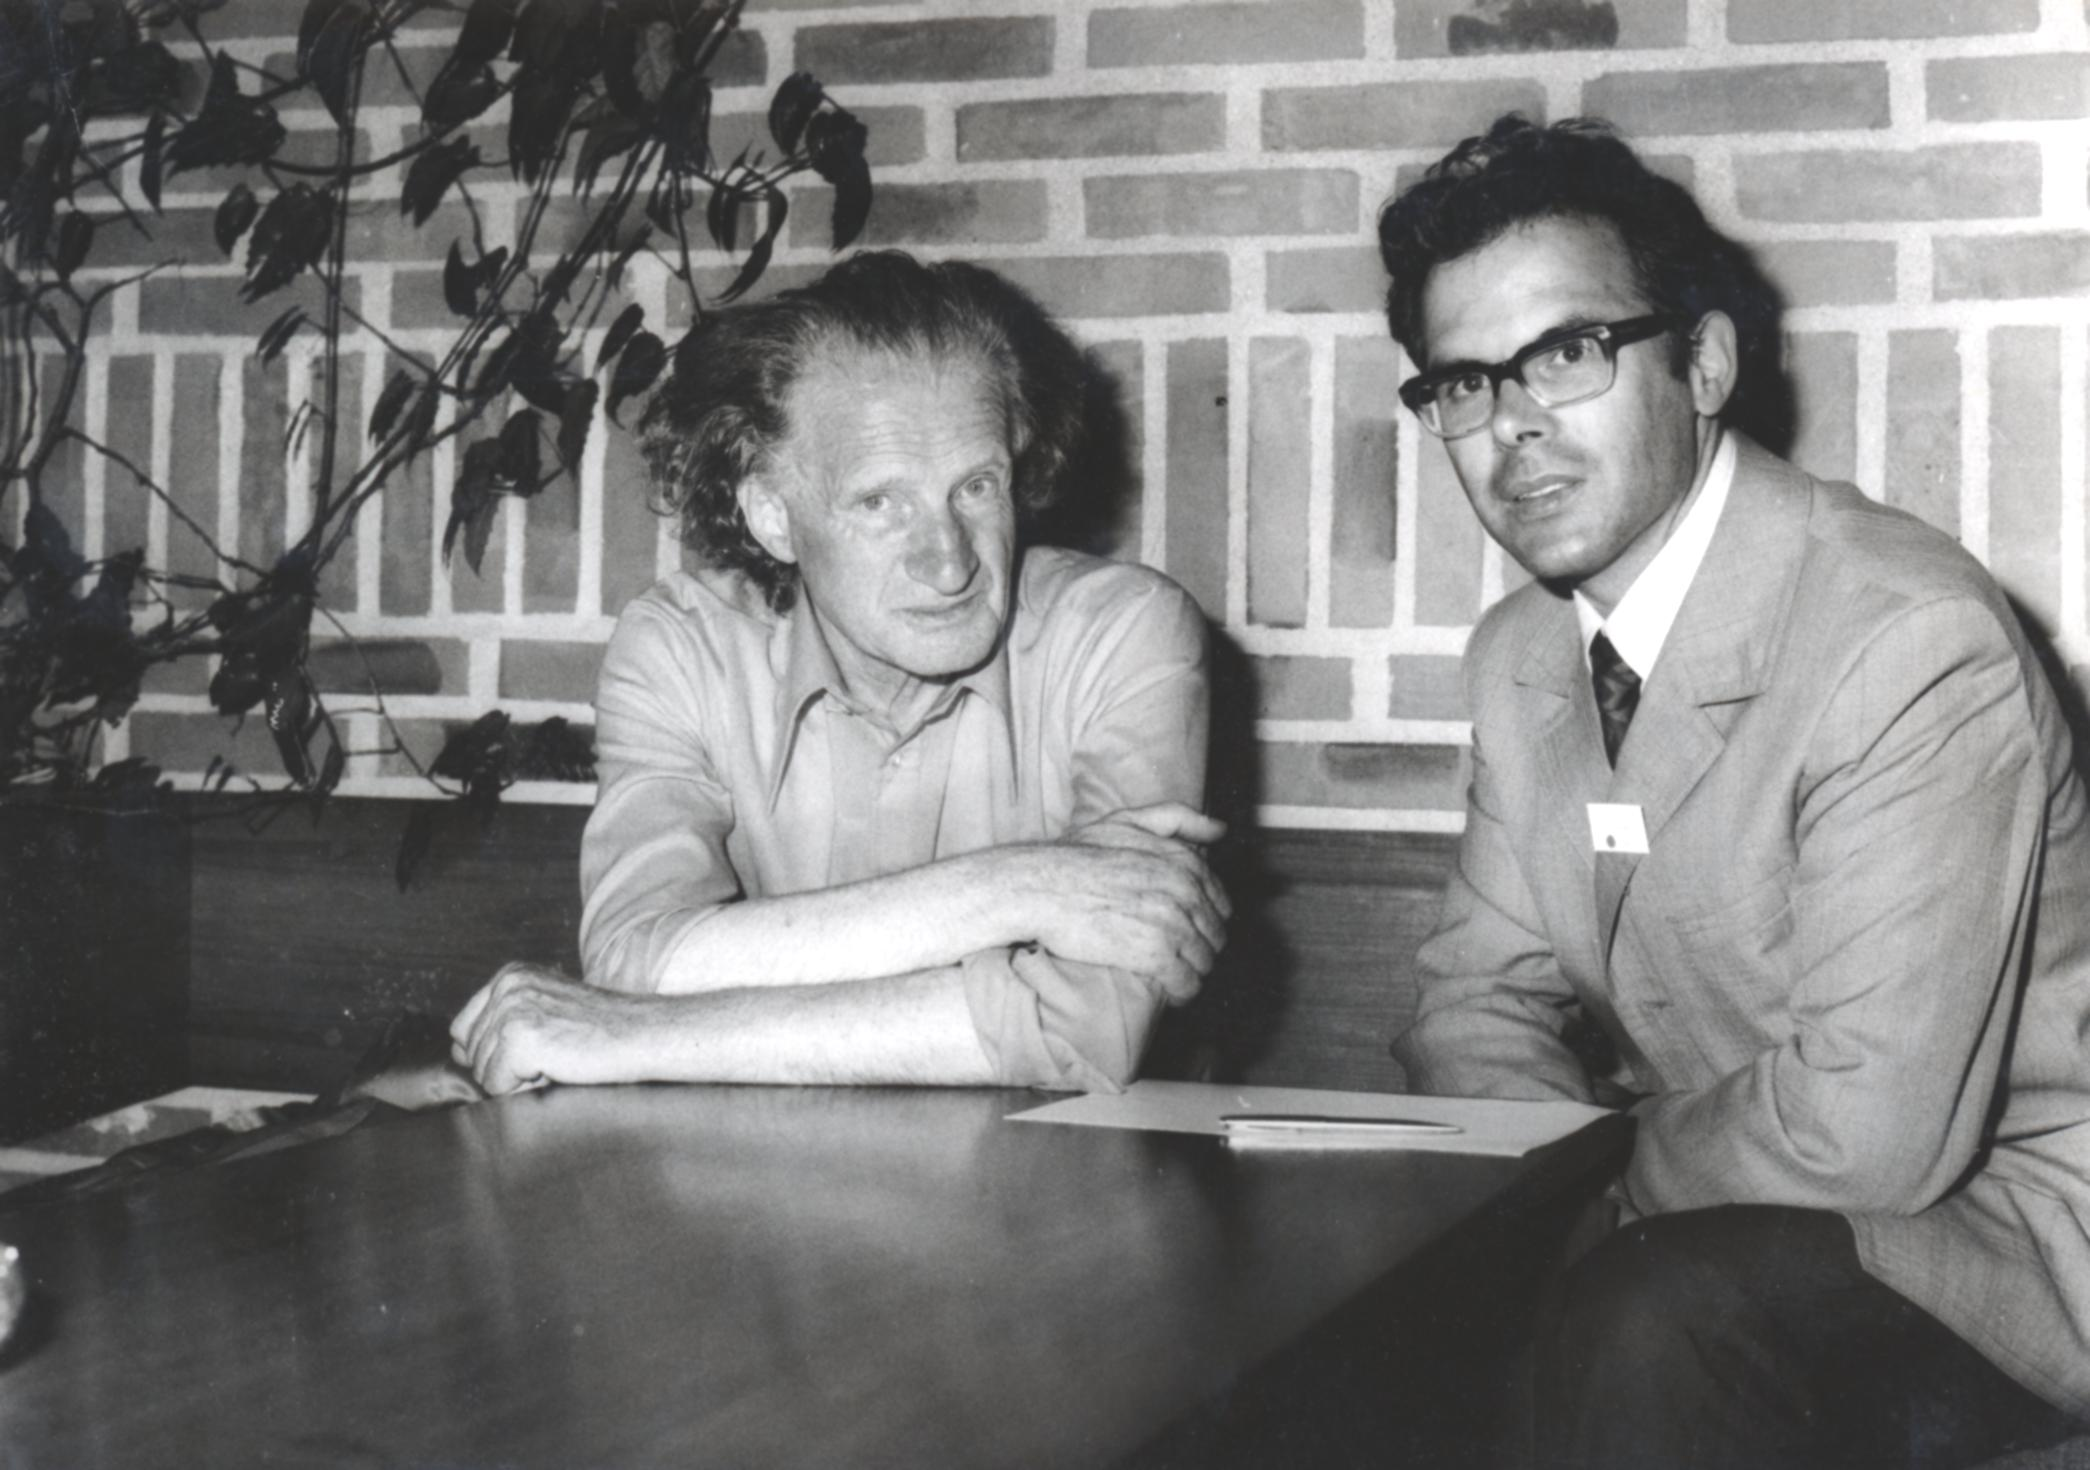 V. Internat. Imago Mundi-Kongress 1974, Cusanus Akademie, Brixen, Gerard Croiset, Prof. Andreas Resch